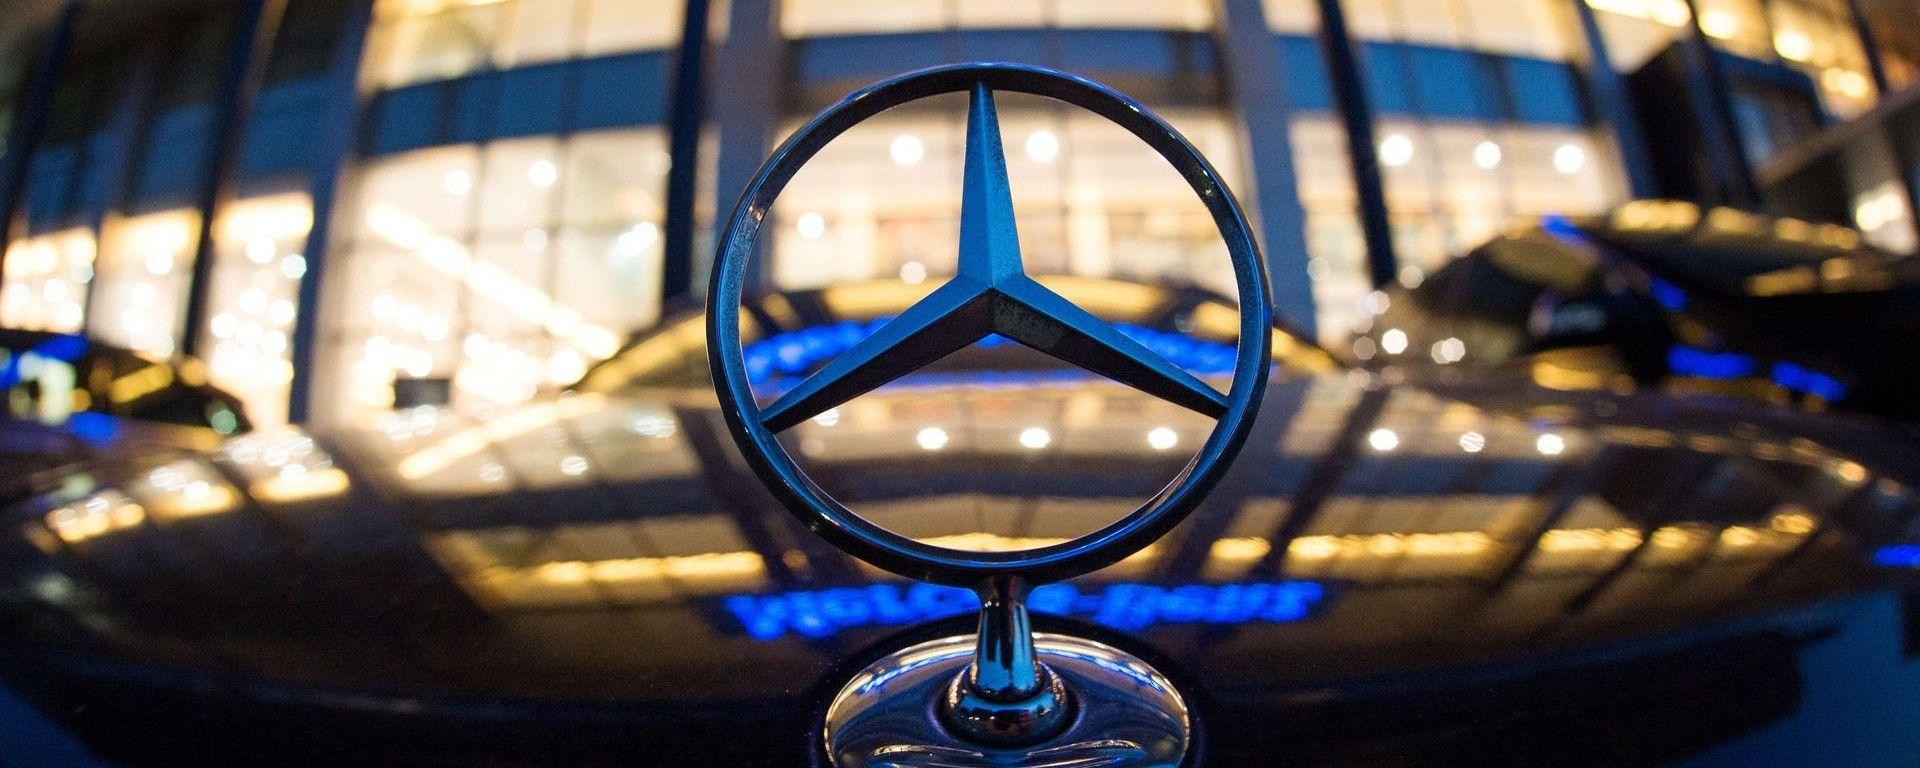 Dieselgate, perquisizioni nella sede di Daimler